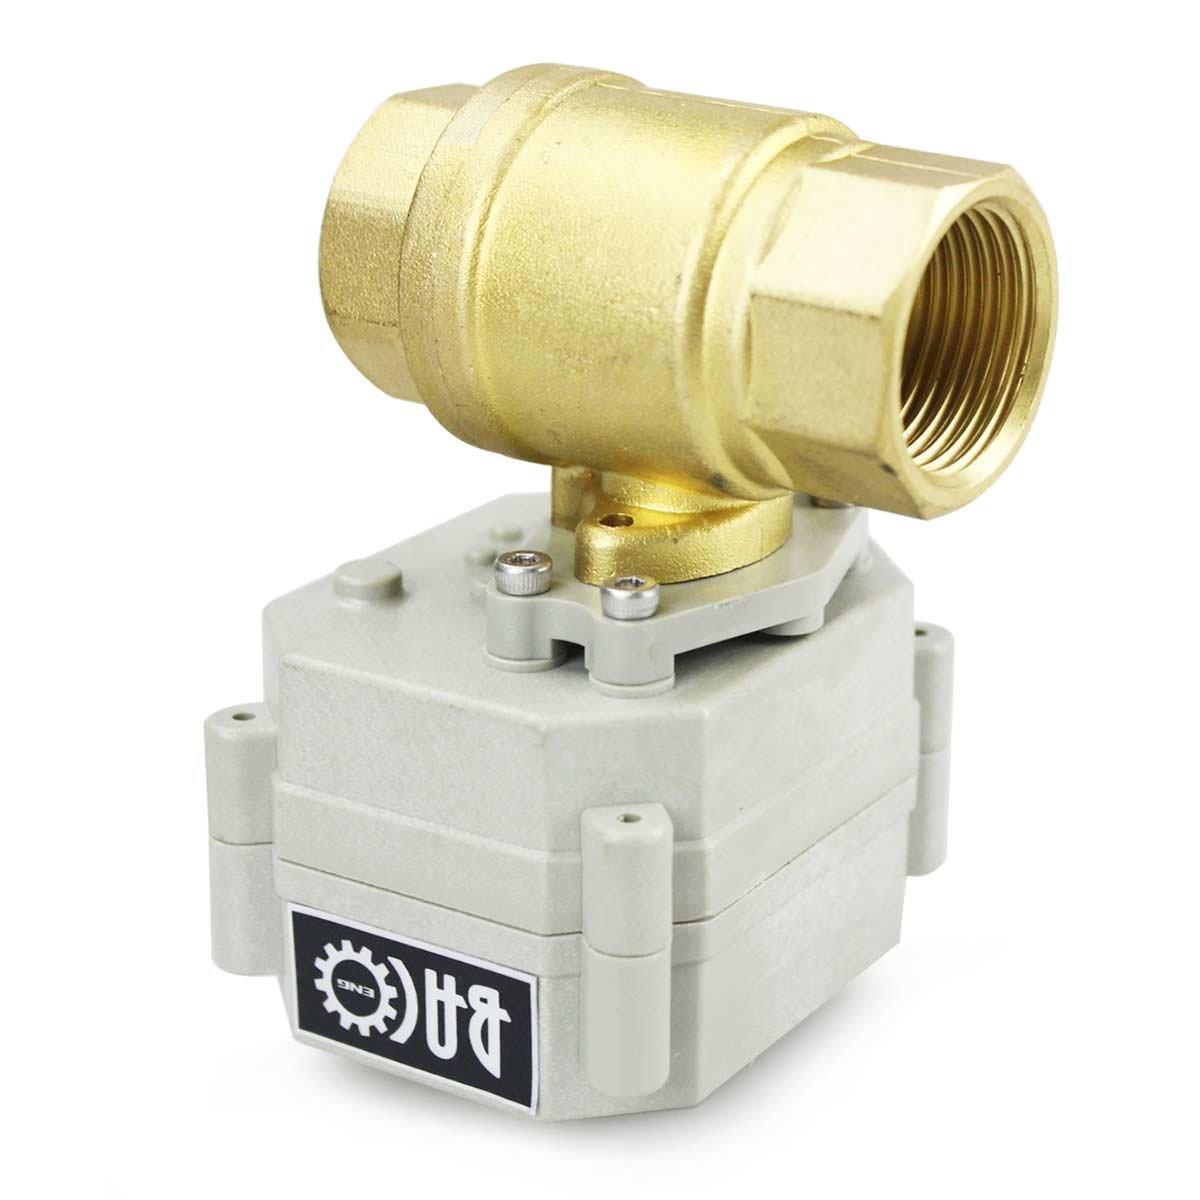 1 1//4 //valvola valvola motore BACOENG 1//2 elettrico Valvola a sfera CR202C di 2 cavi AC 110-230 V ottone//SS//a 3 Vie, 2 Vie, a vite//BSP 1 Brass